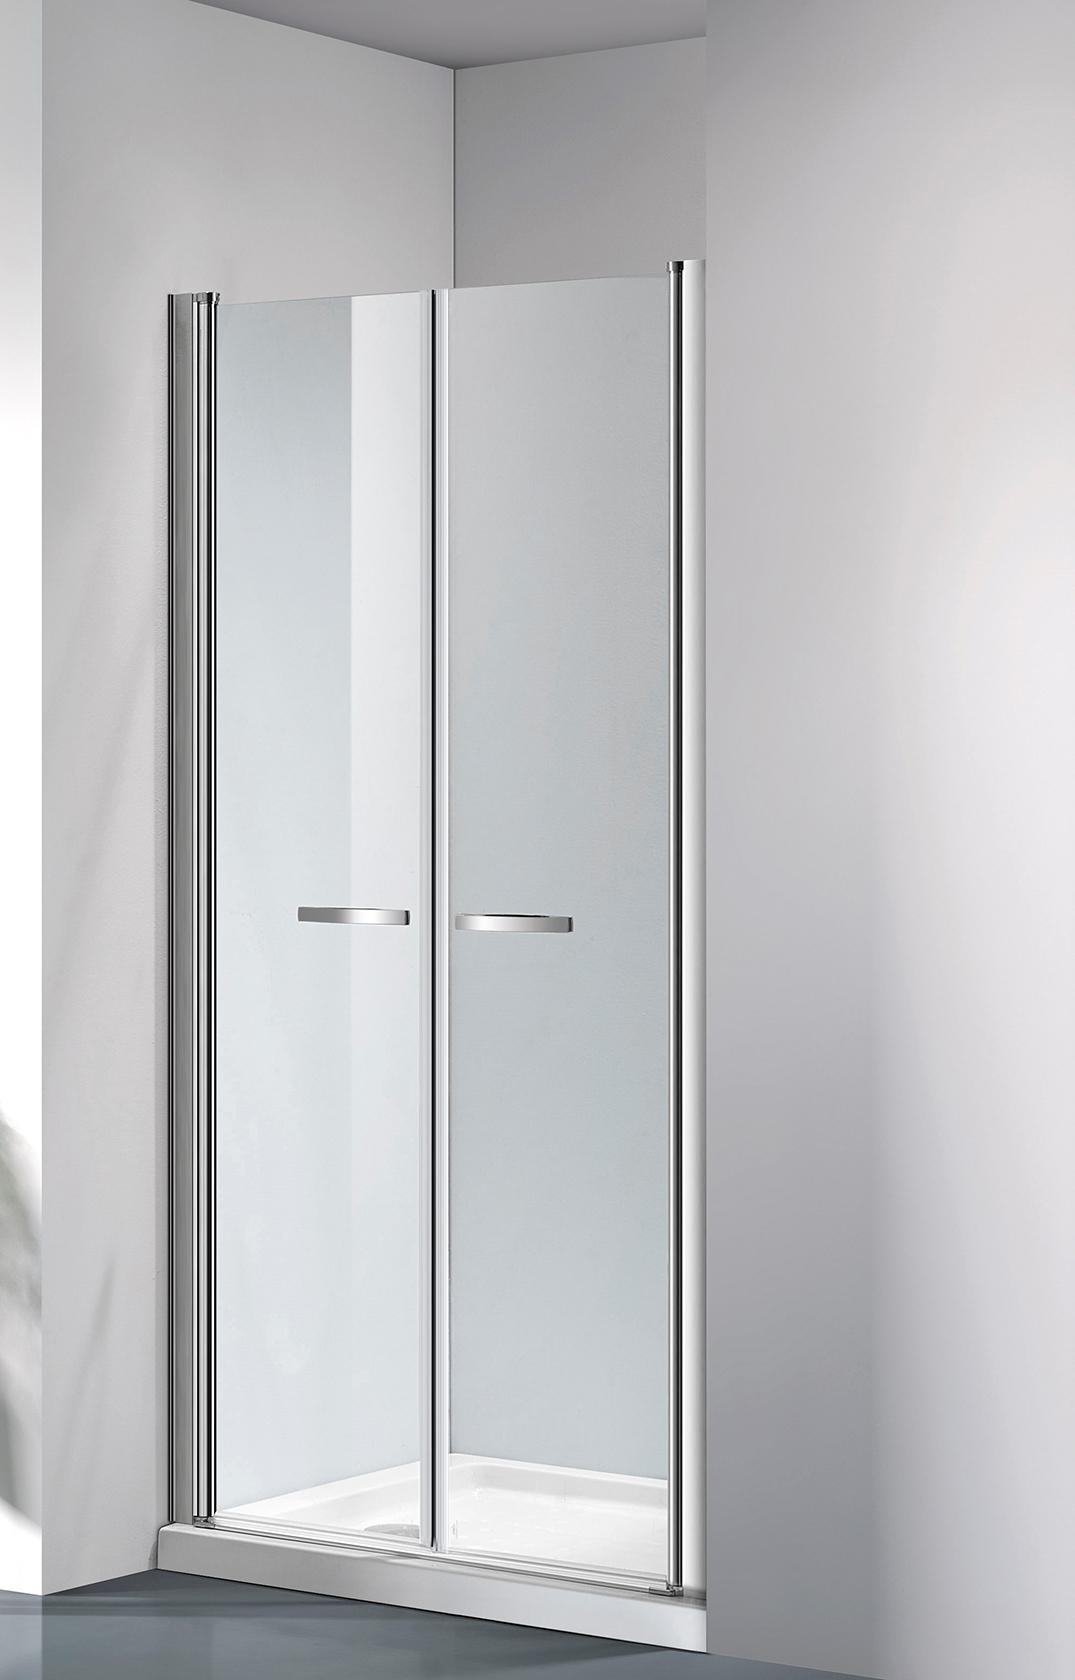 ARTTEC COMFORT 116-121 grape NEW - Sprchové dveře do niky